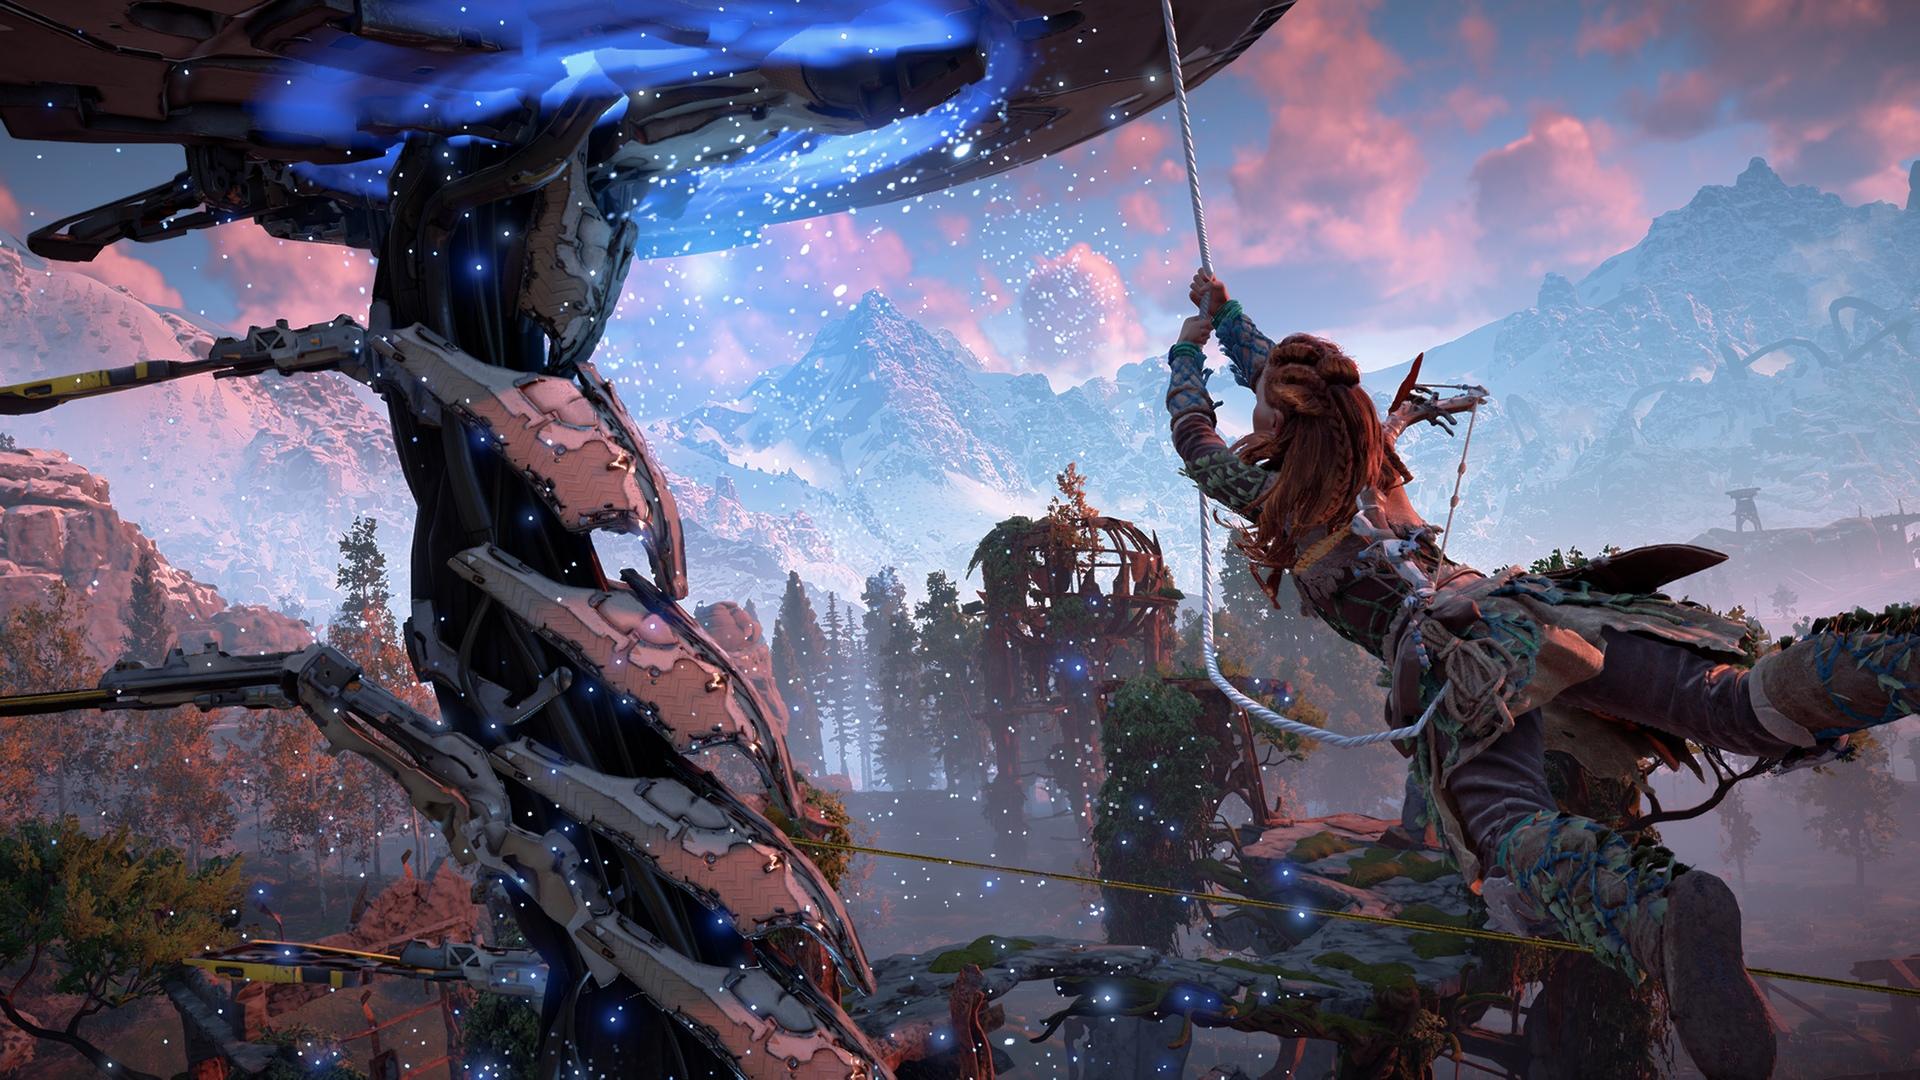 Horizon Zero Dawn Box Art: Hypothetical 'Horizon: Zero Dawn' Sequel Could Feature